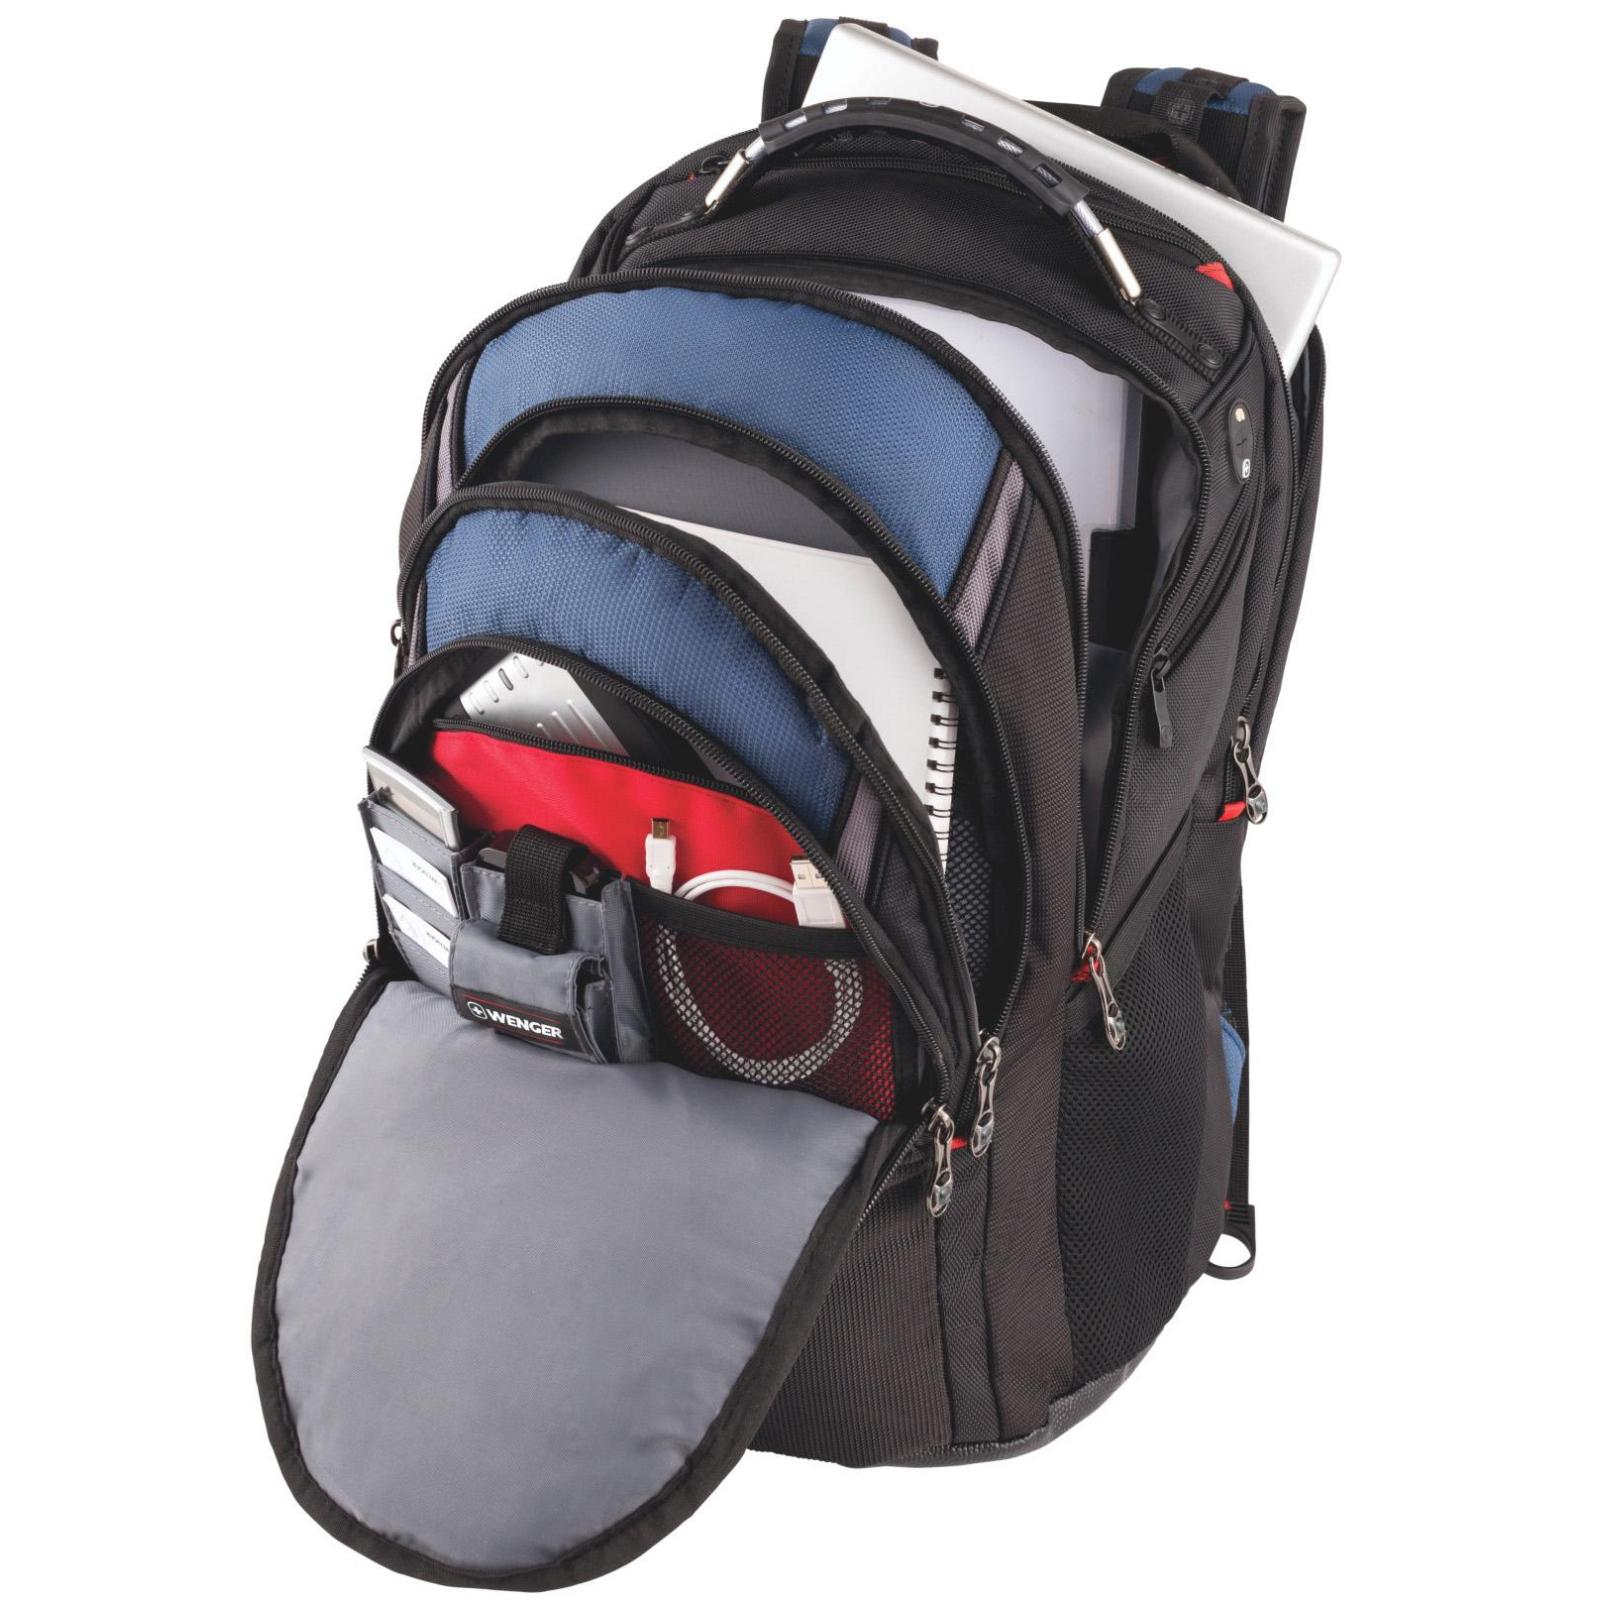 "Рюкзак для ноутбука Wenger 17"" Ibex Black/Blue (600638) изображение 5"